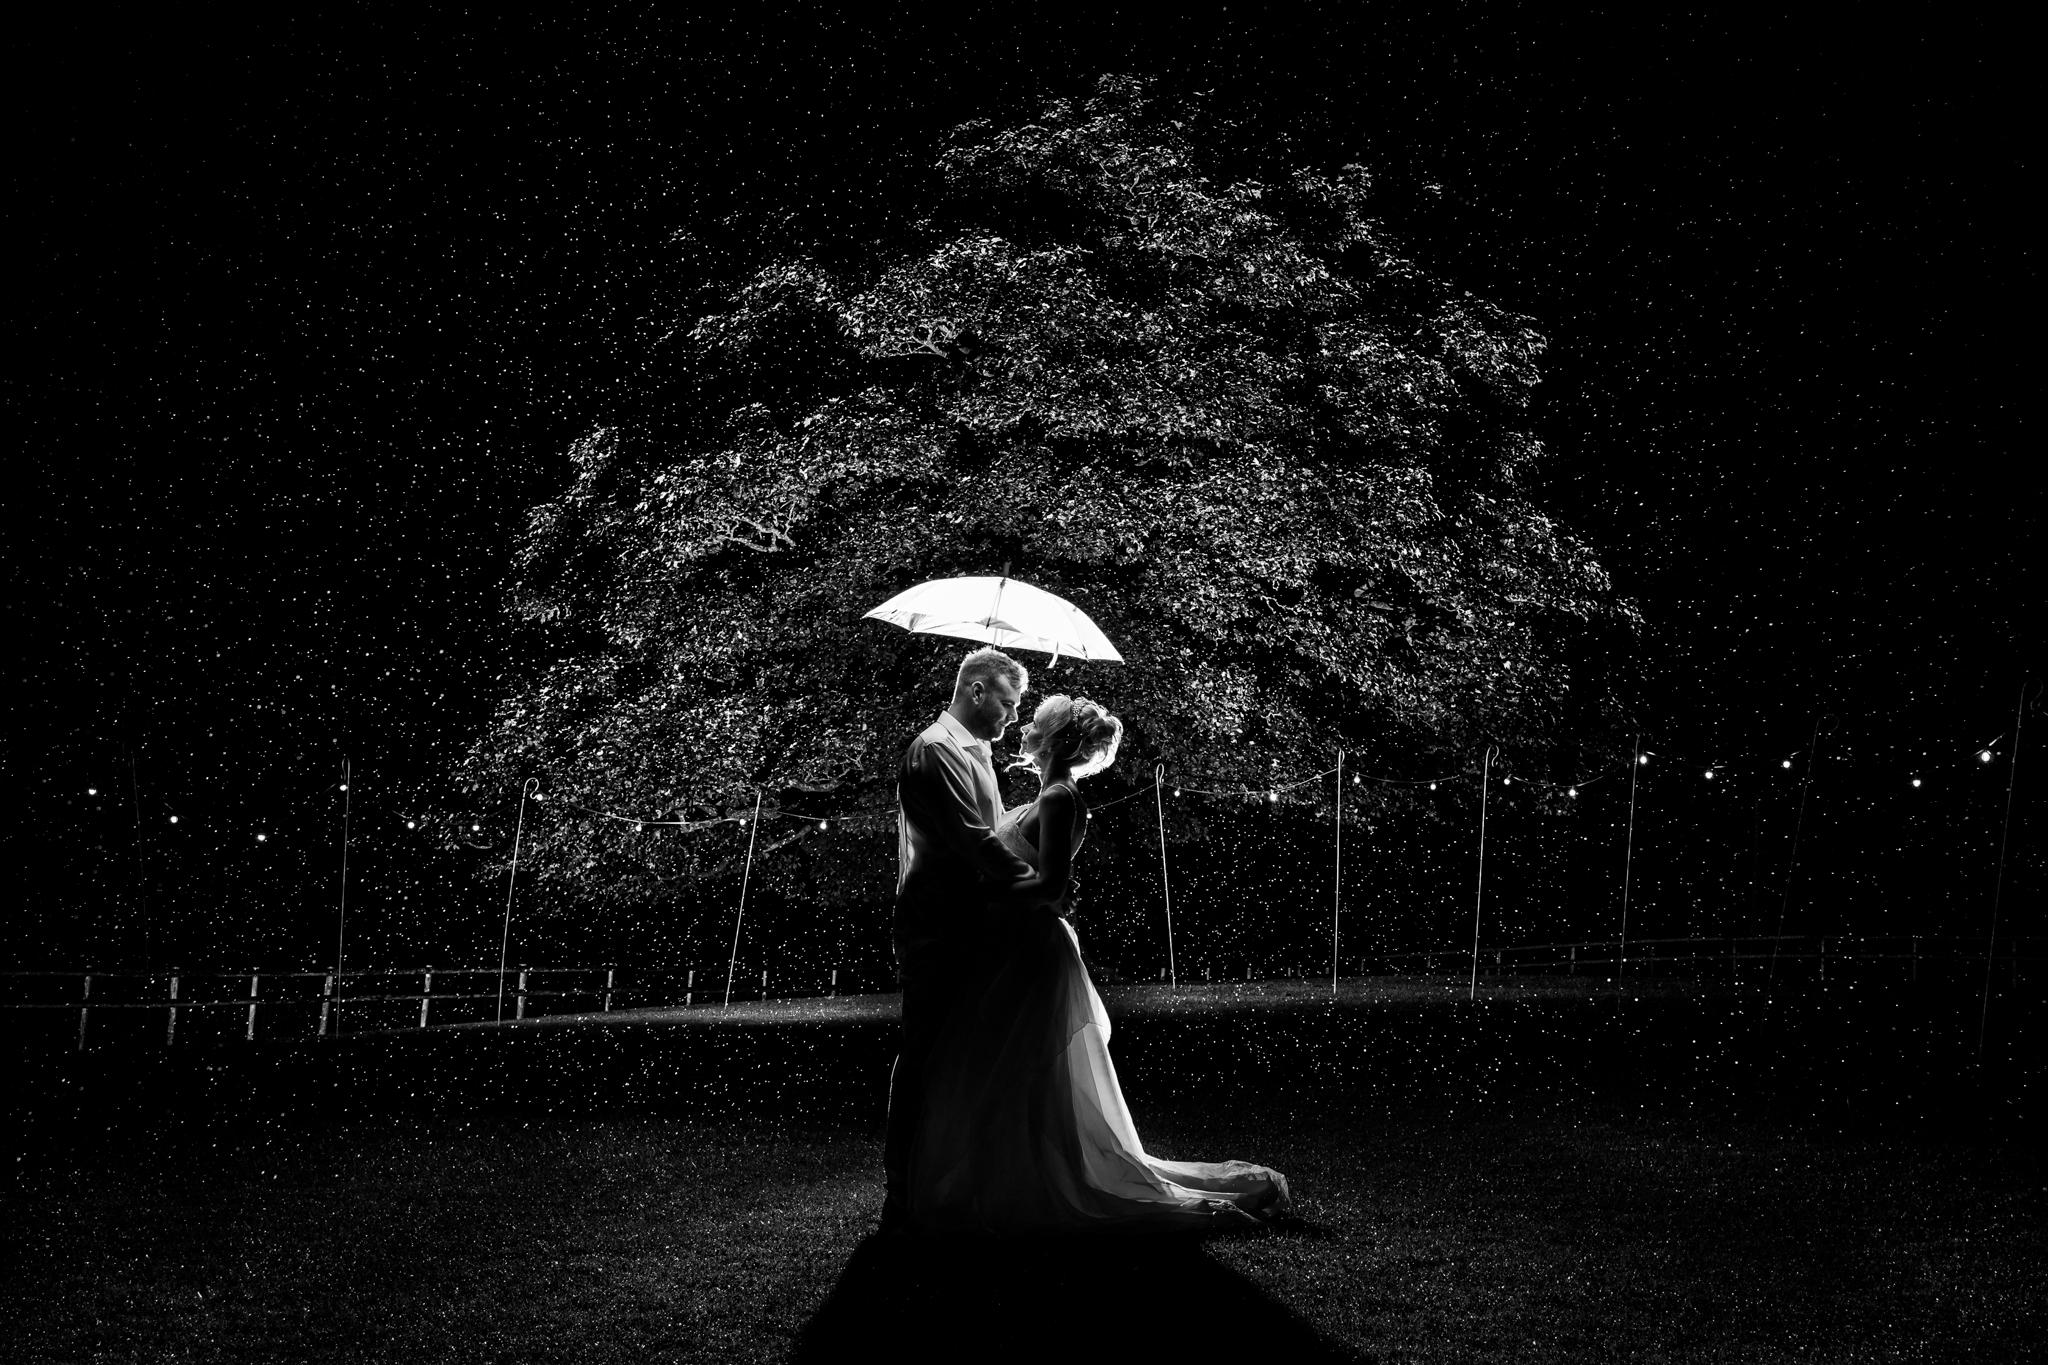 Heaton House Farm night wedding photography